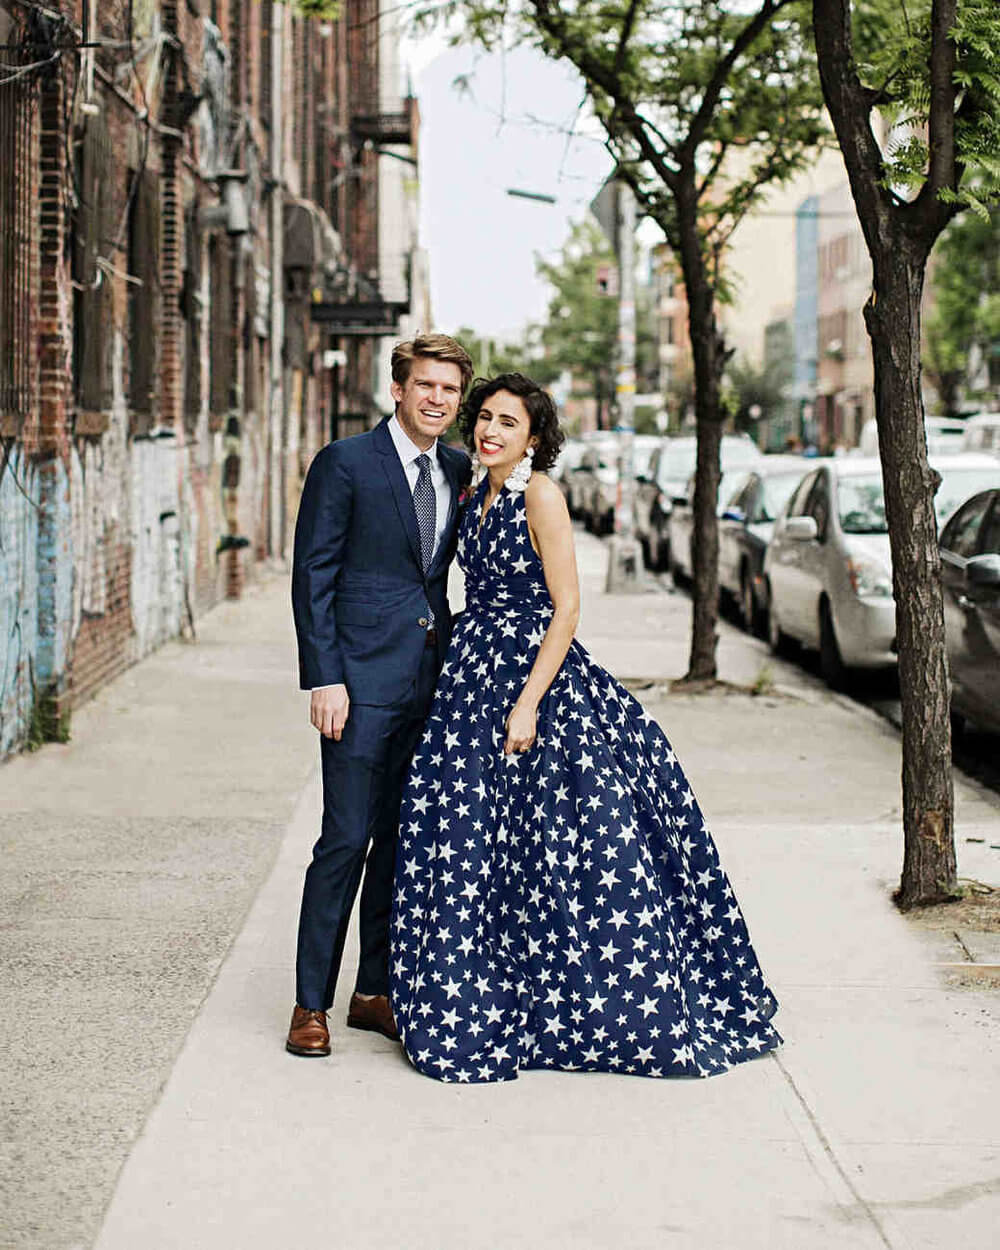 Bridal_Wedding_Imagery_9.jpg